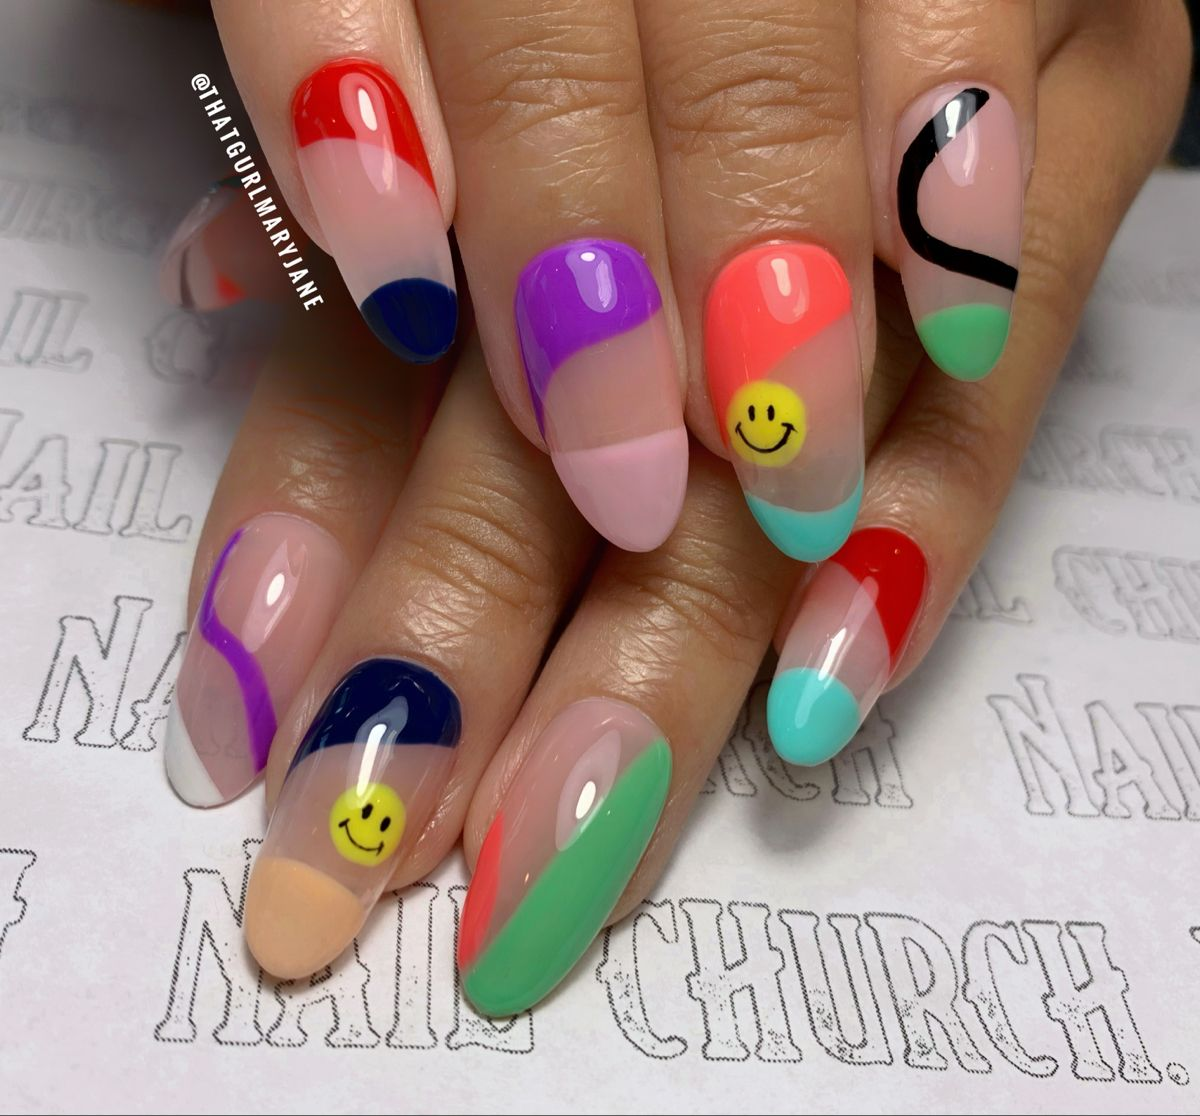 #nails #nailart #nailsofinstagram #naildesigns #nailstagram #abstract #nailstyle #nailsmagazine #nailideas #nailsonfleek #nailswag #colorful #apres #thegelbottle #thegelbottleinc